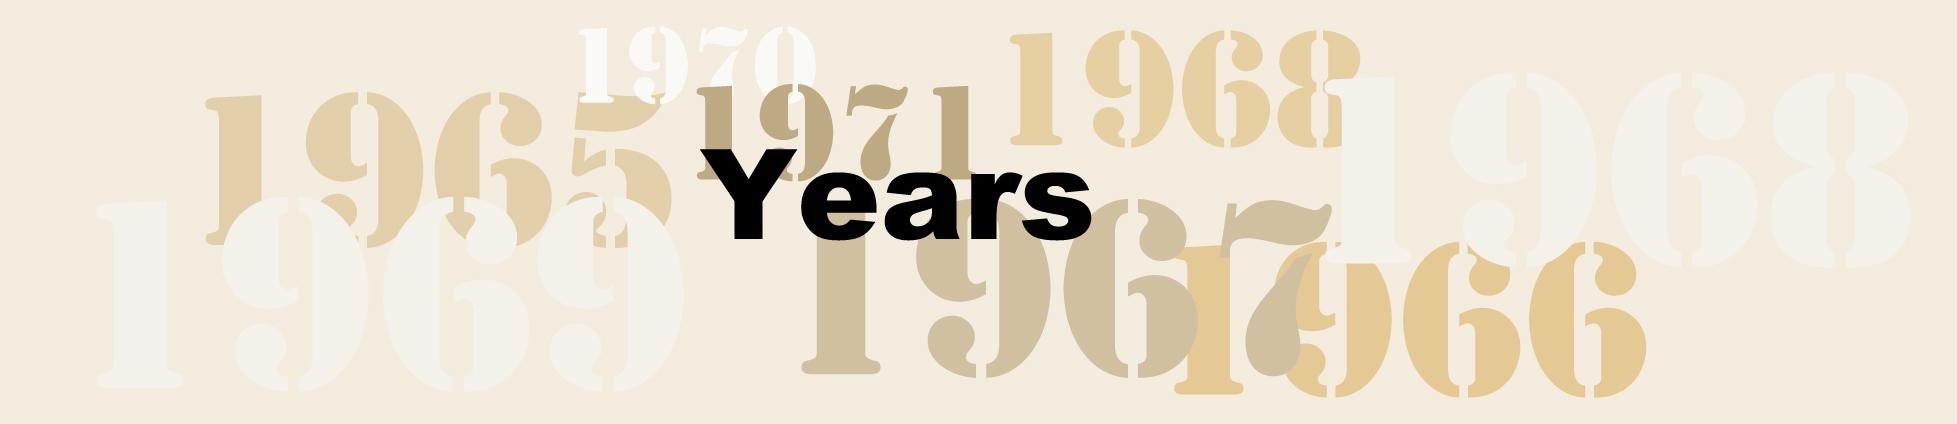 Years banner